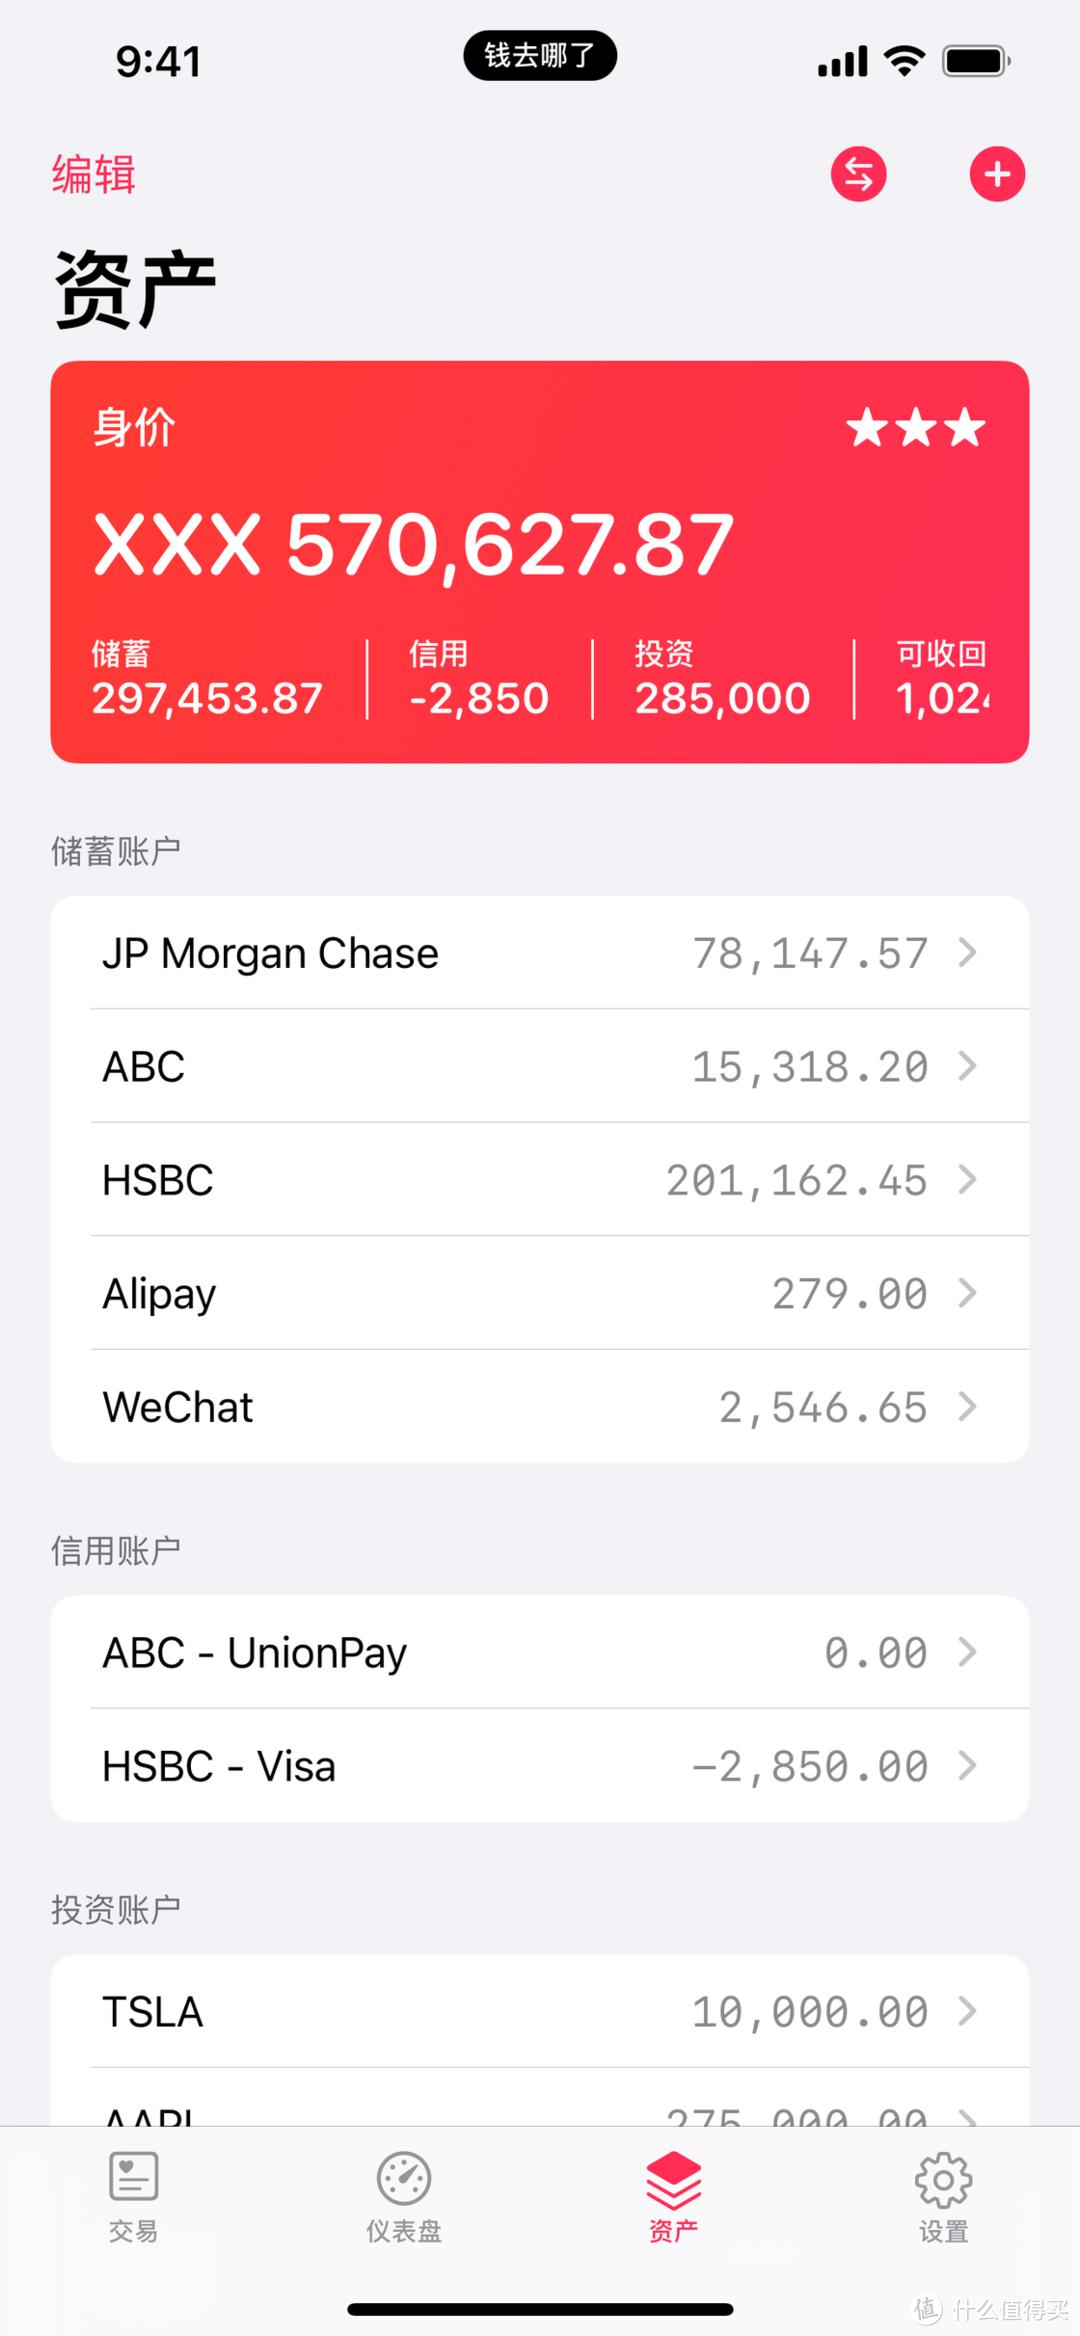 MoneyThings - 钱去哪了,不一样的记账软件